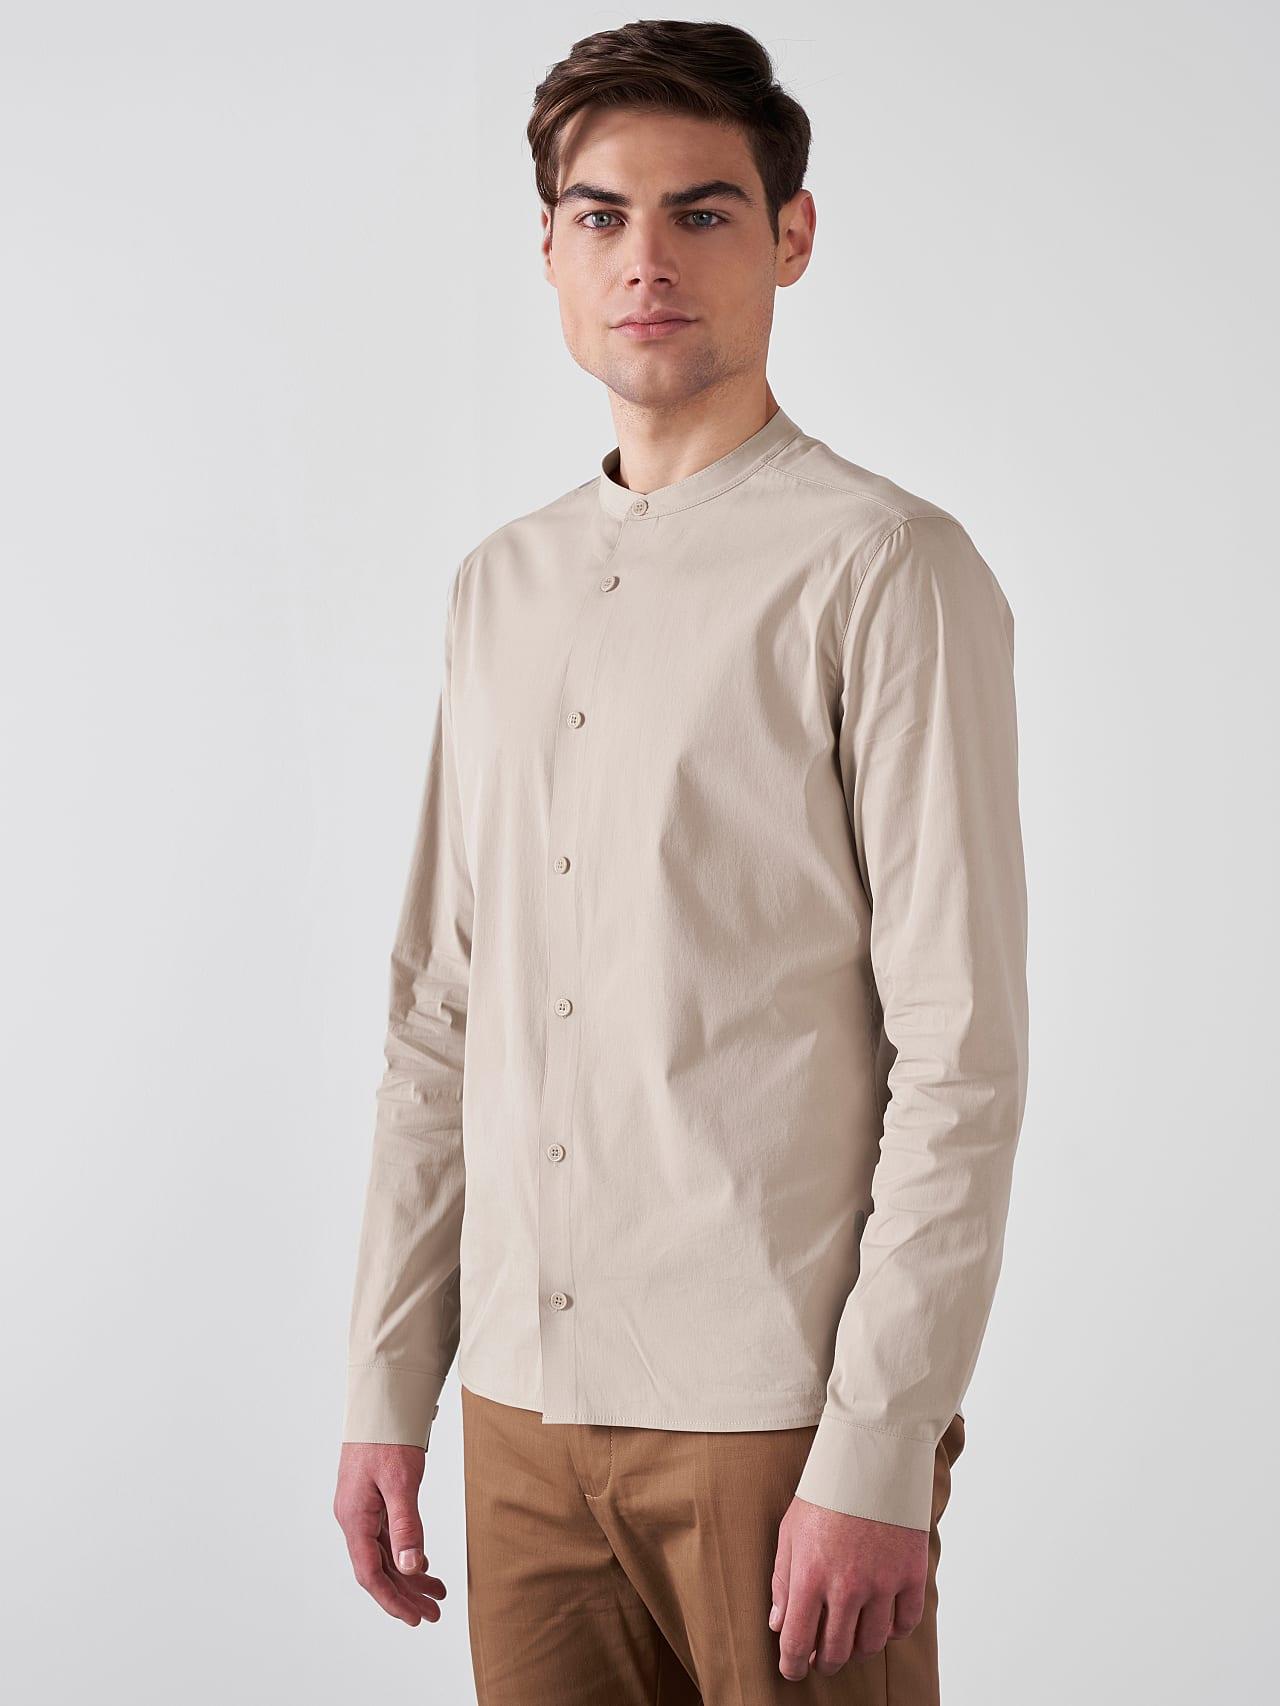 WIDT V9.Y5.01 Stand-Up Collar Cotton-Stretch Shirt Sand Model shot Alpha Tauri